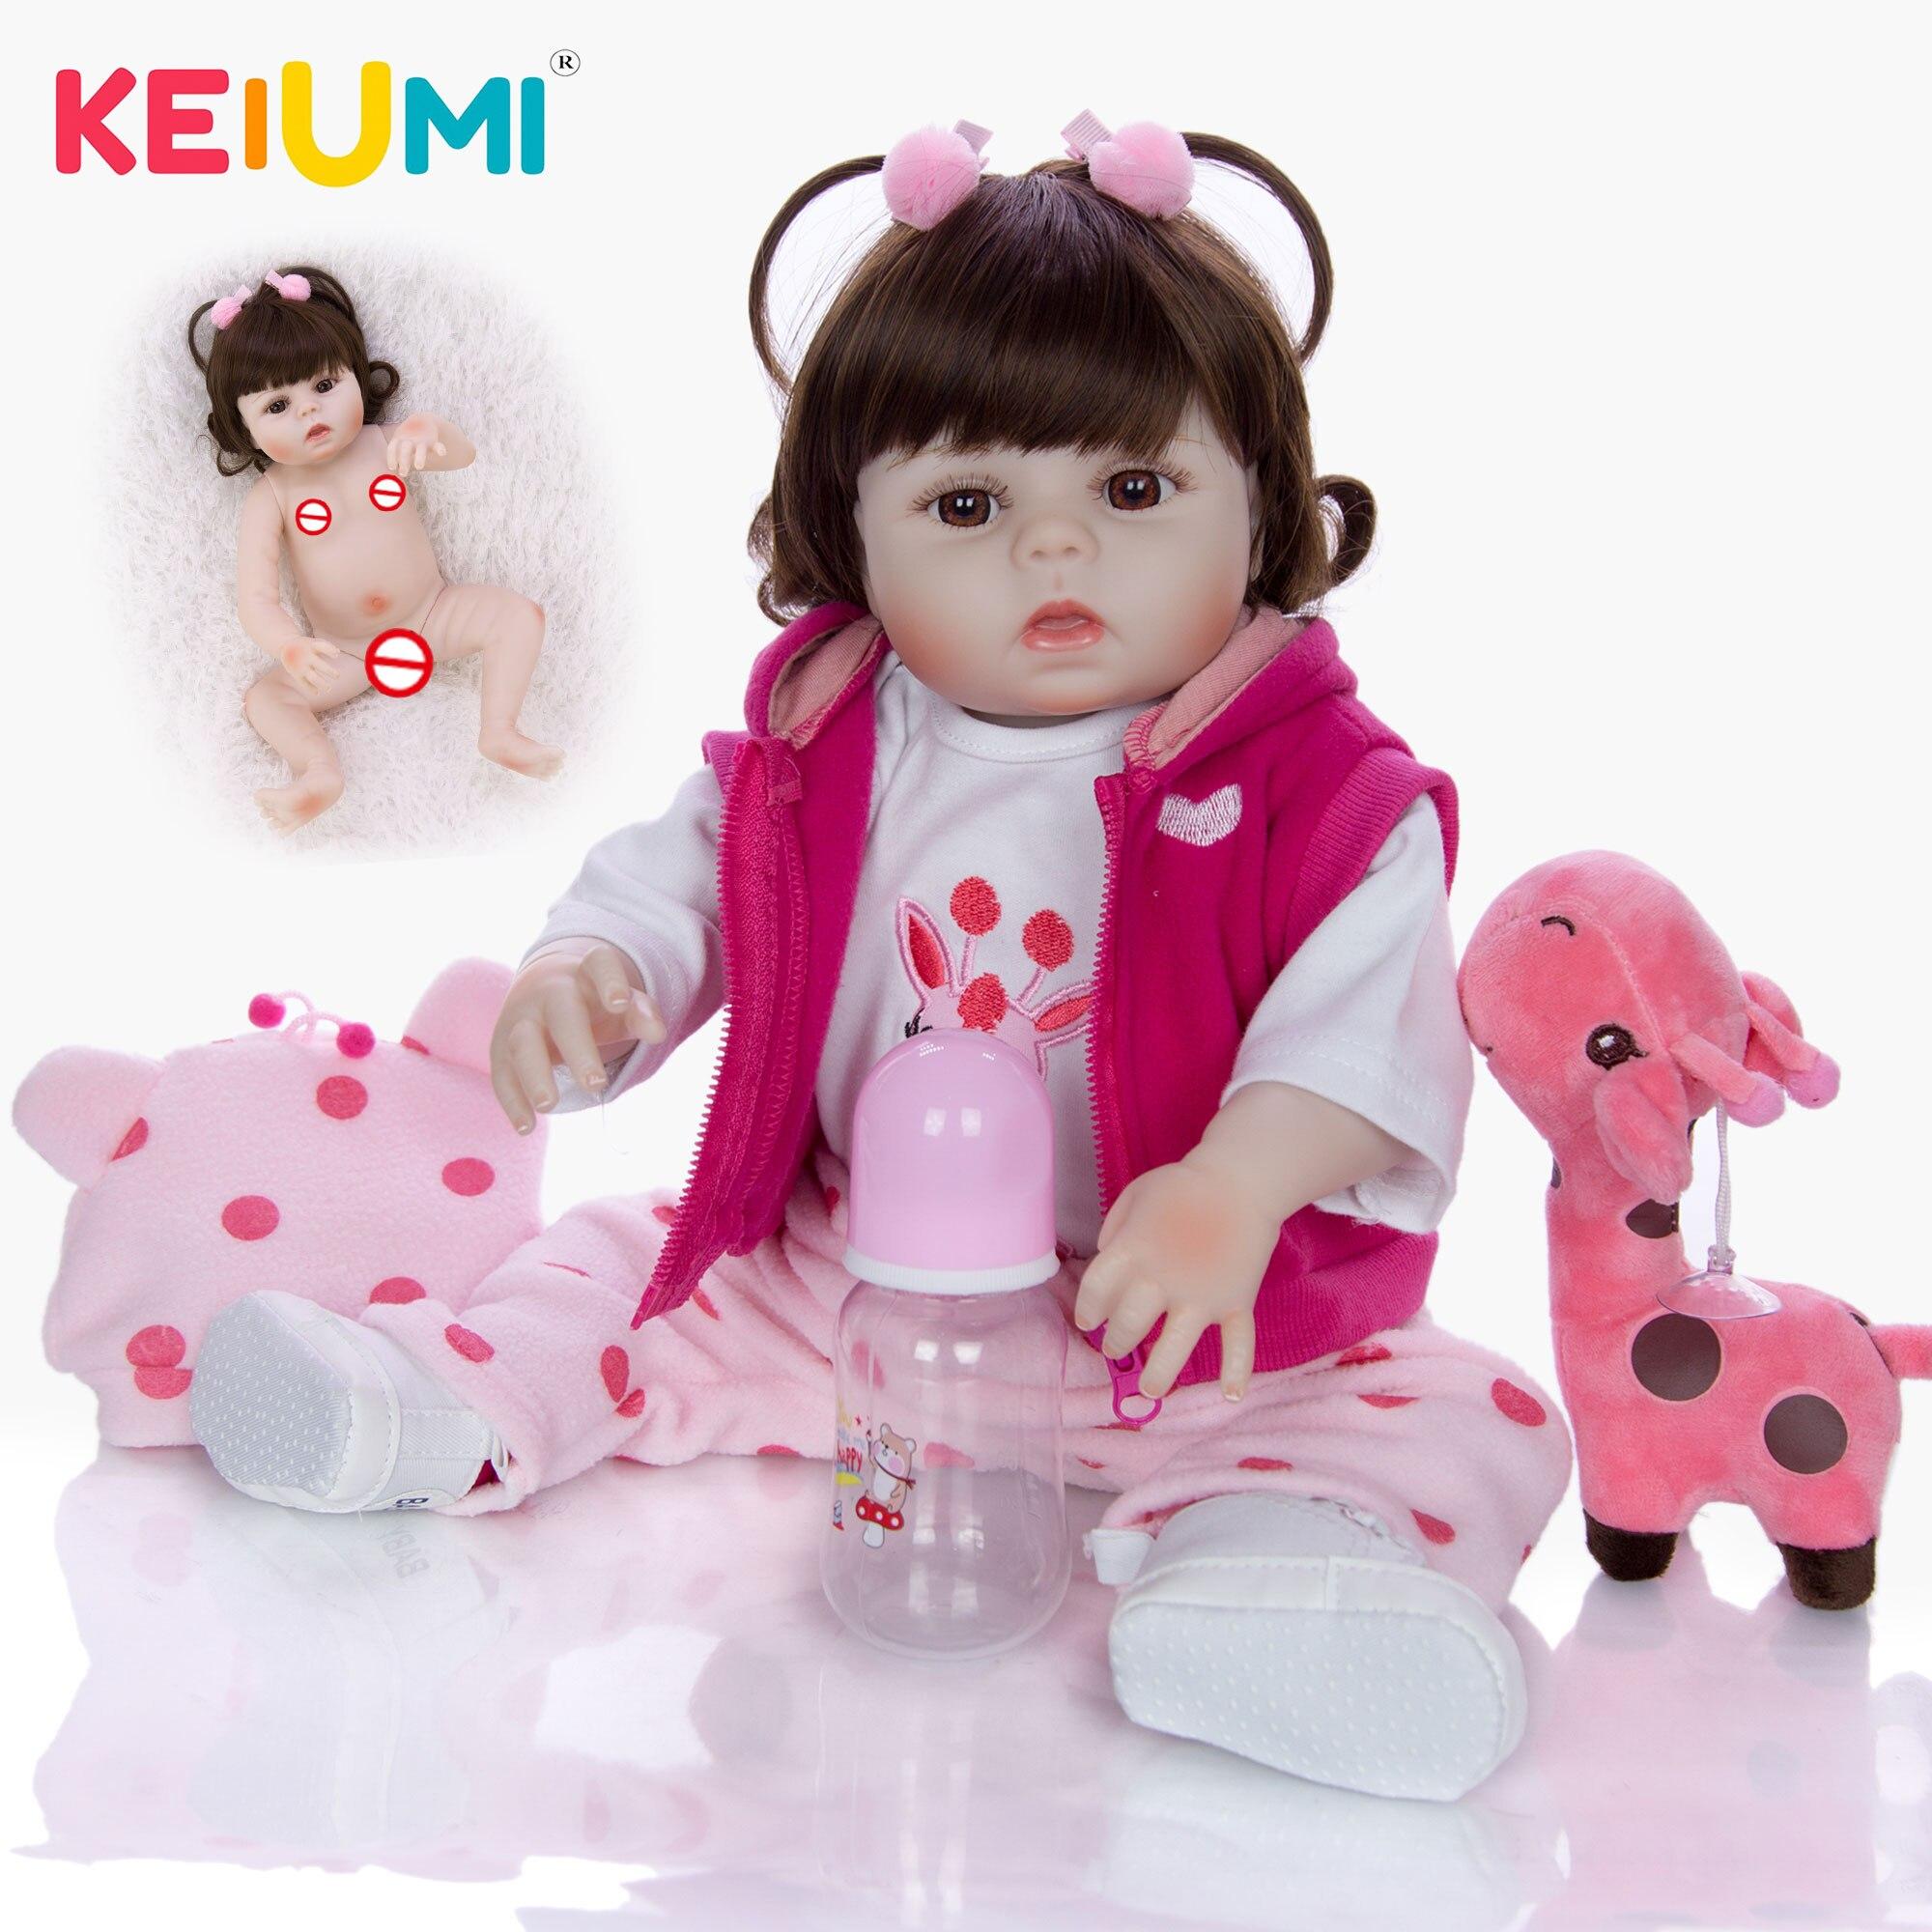 Bebe reborn fille realiste Keiumi 0002